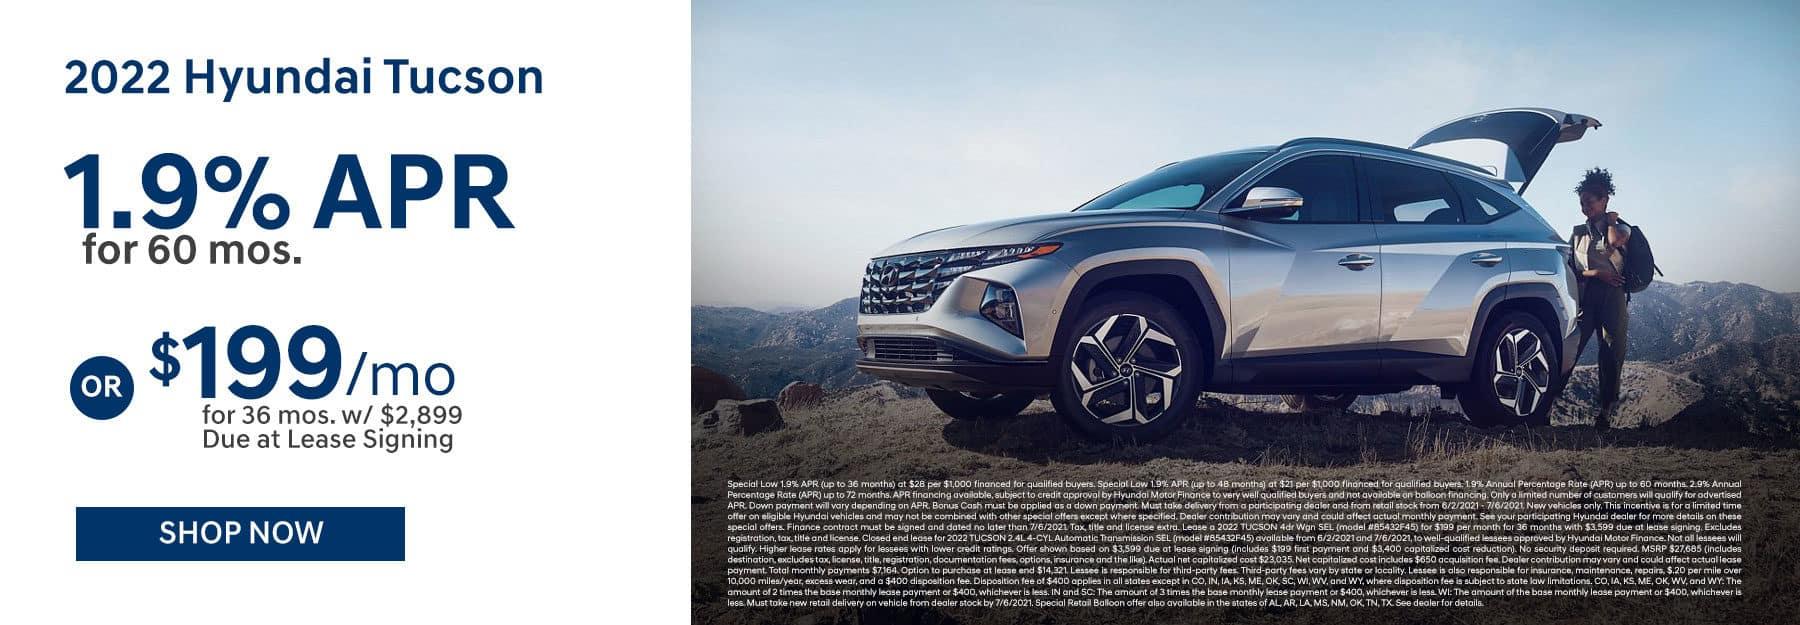 2022 Hyundai Tucson June Offer in Greenville, TX